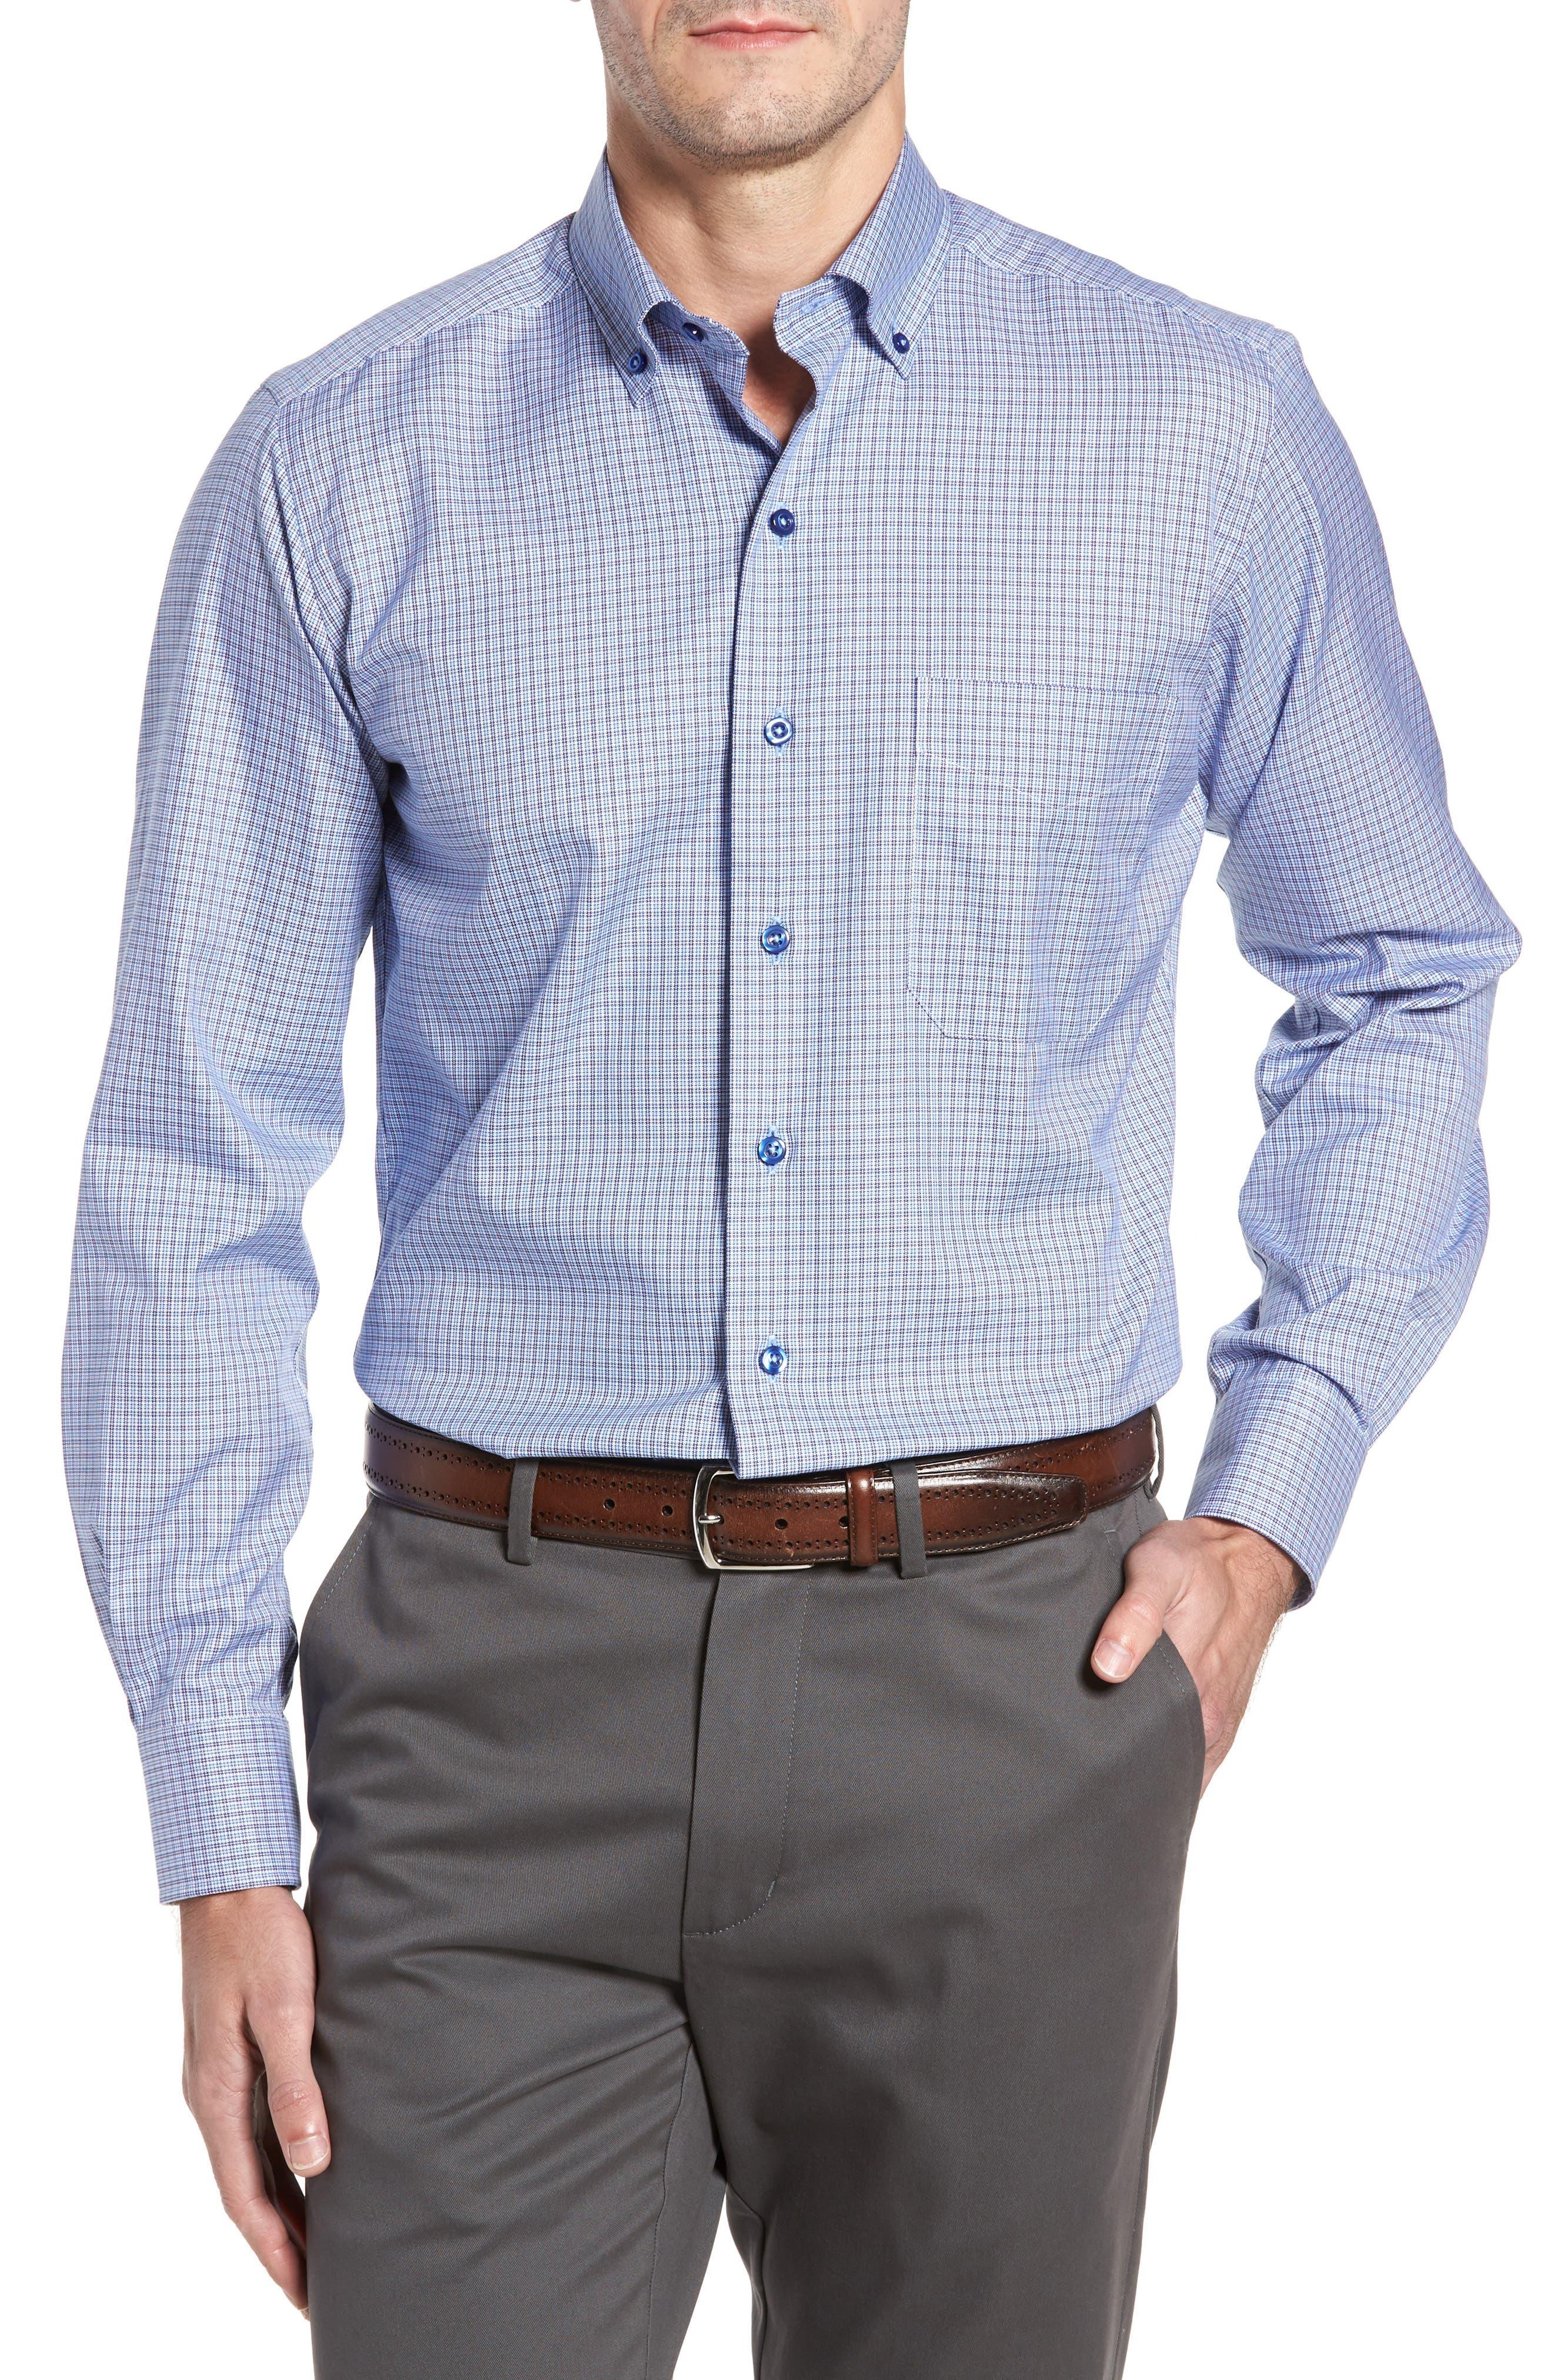 Alternate Image 1 Selected - David Donahue Regular Fit Plaid Sport Shirt